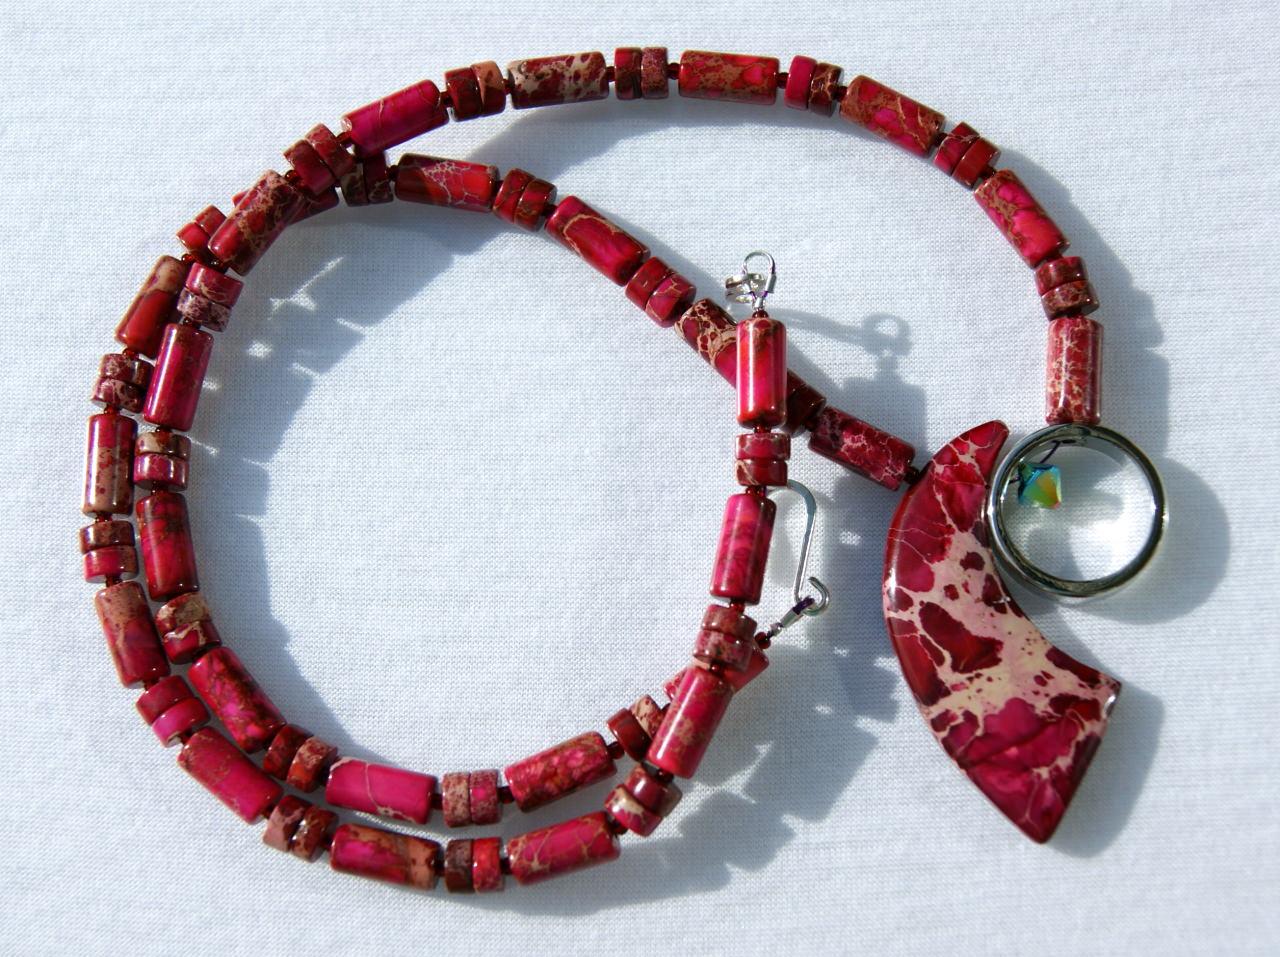 Kleinesbild - Kette SEGEL rot Sediment - Jaspis Ring Edelstahl Edelsteinschmuck